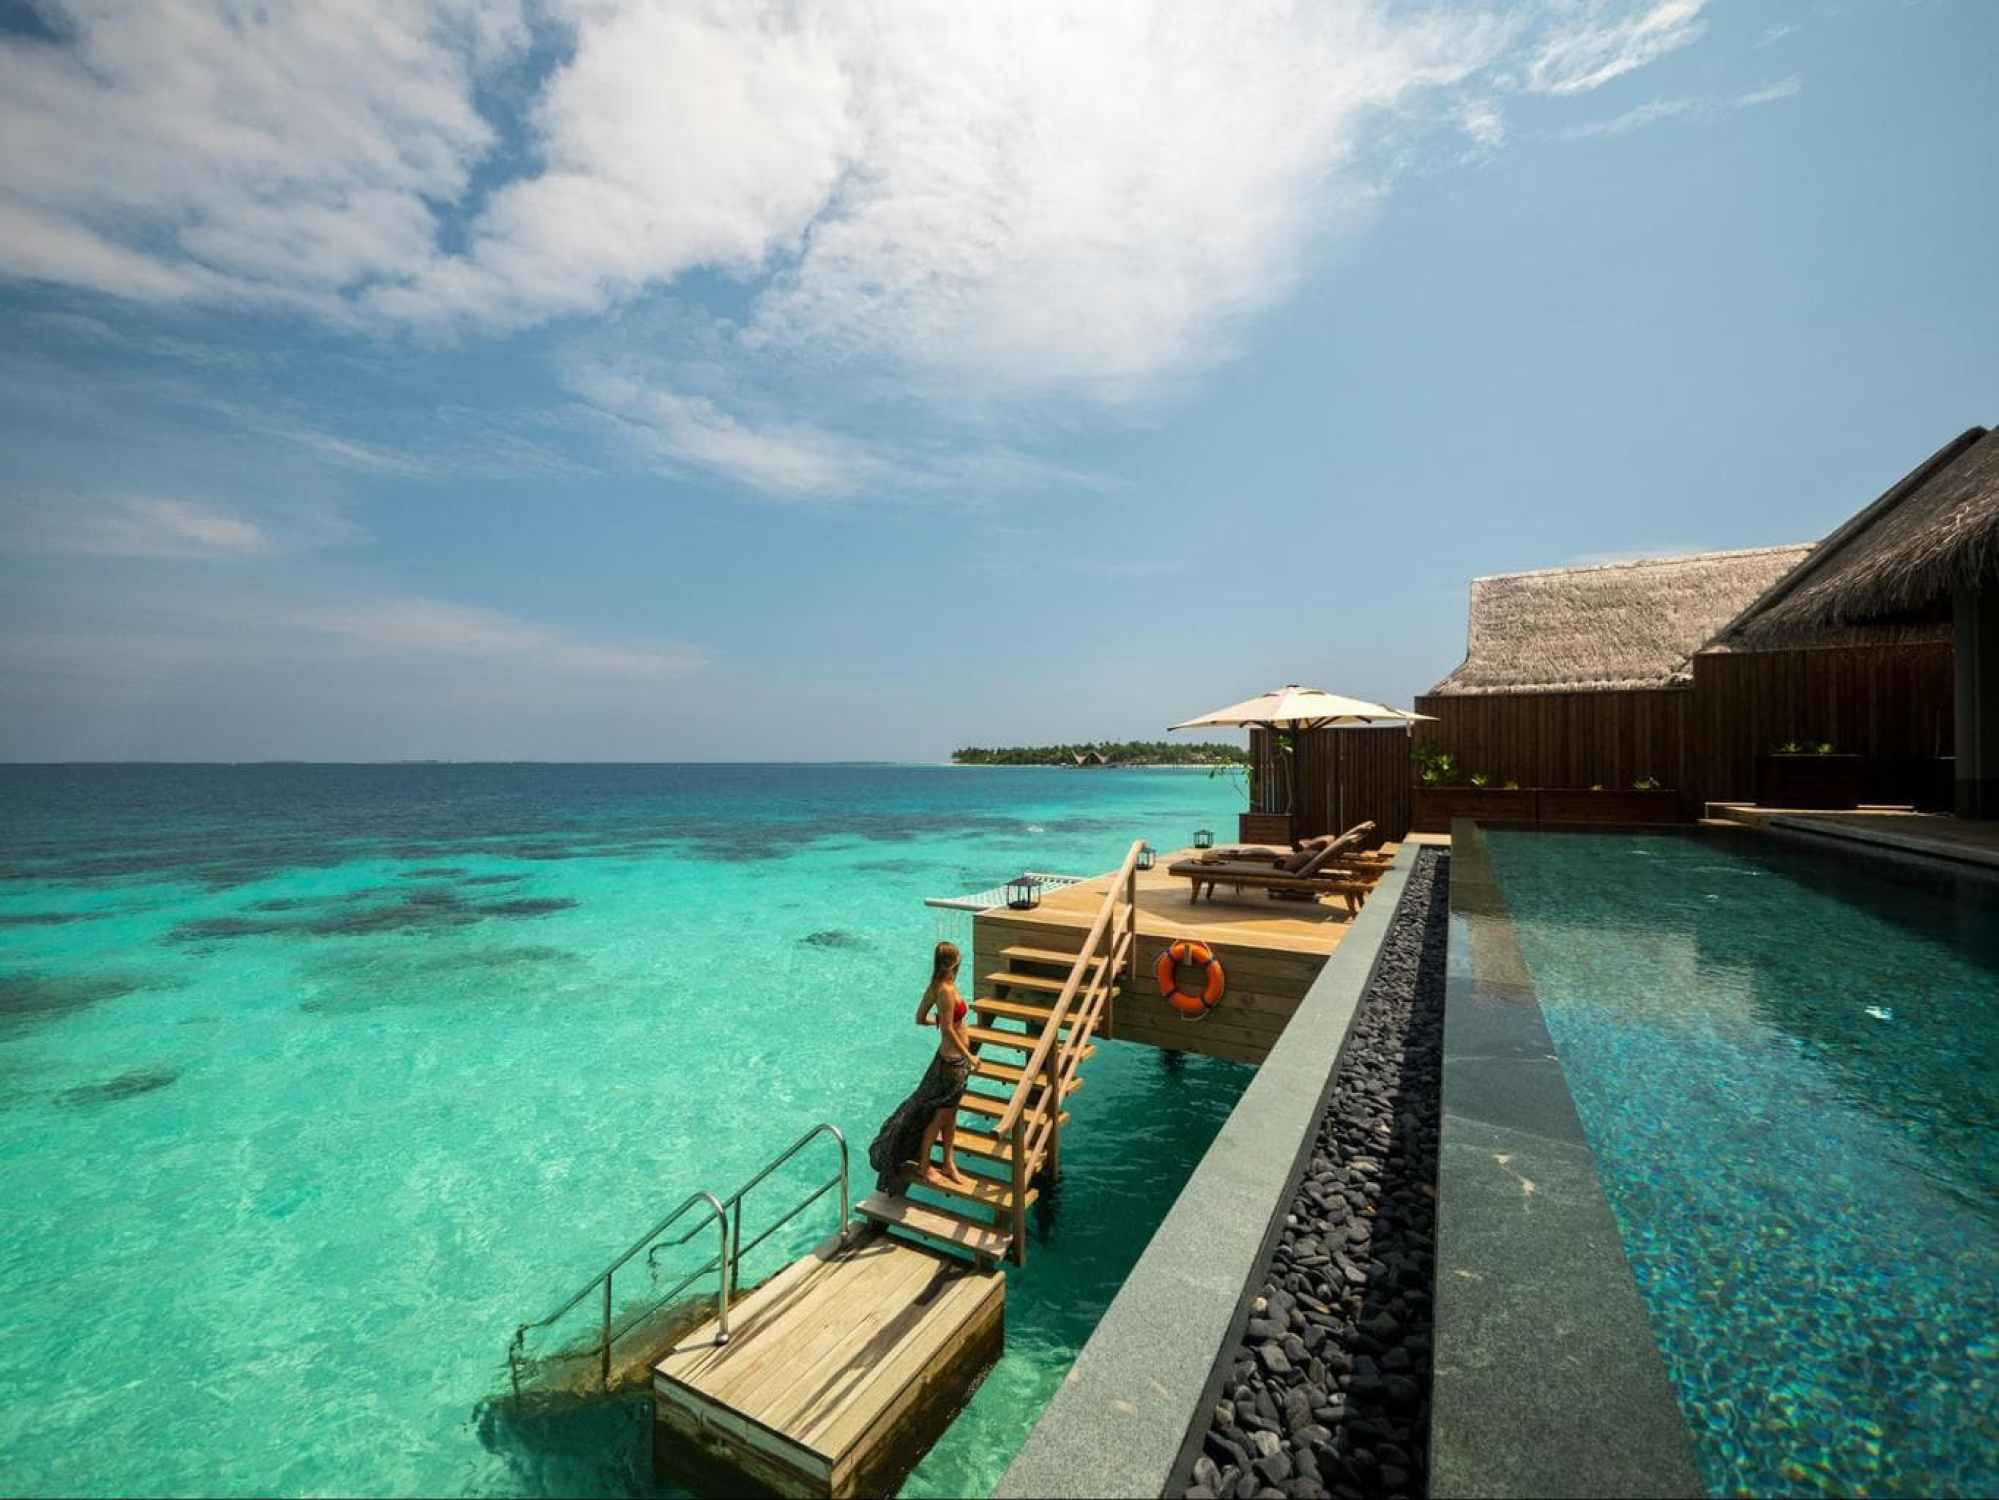 Outdoor decks of the over water villas at Joali Maldives